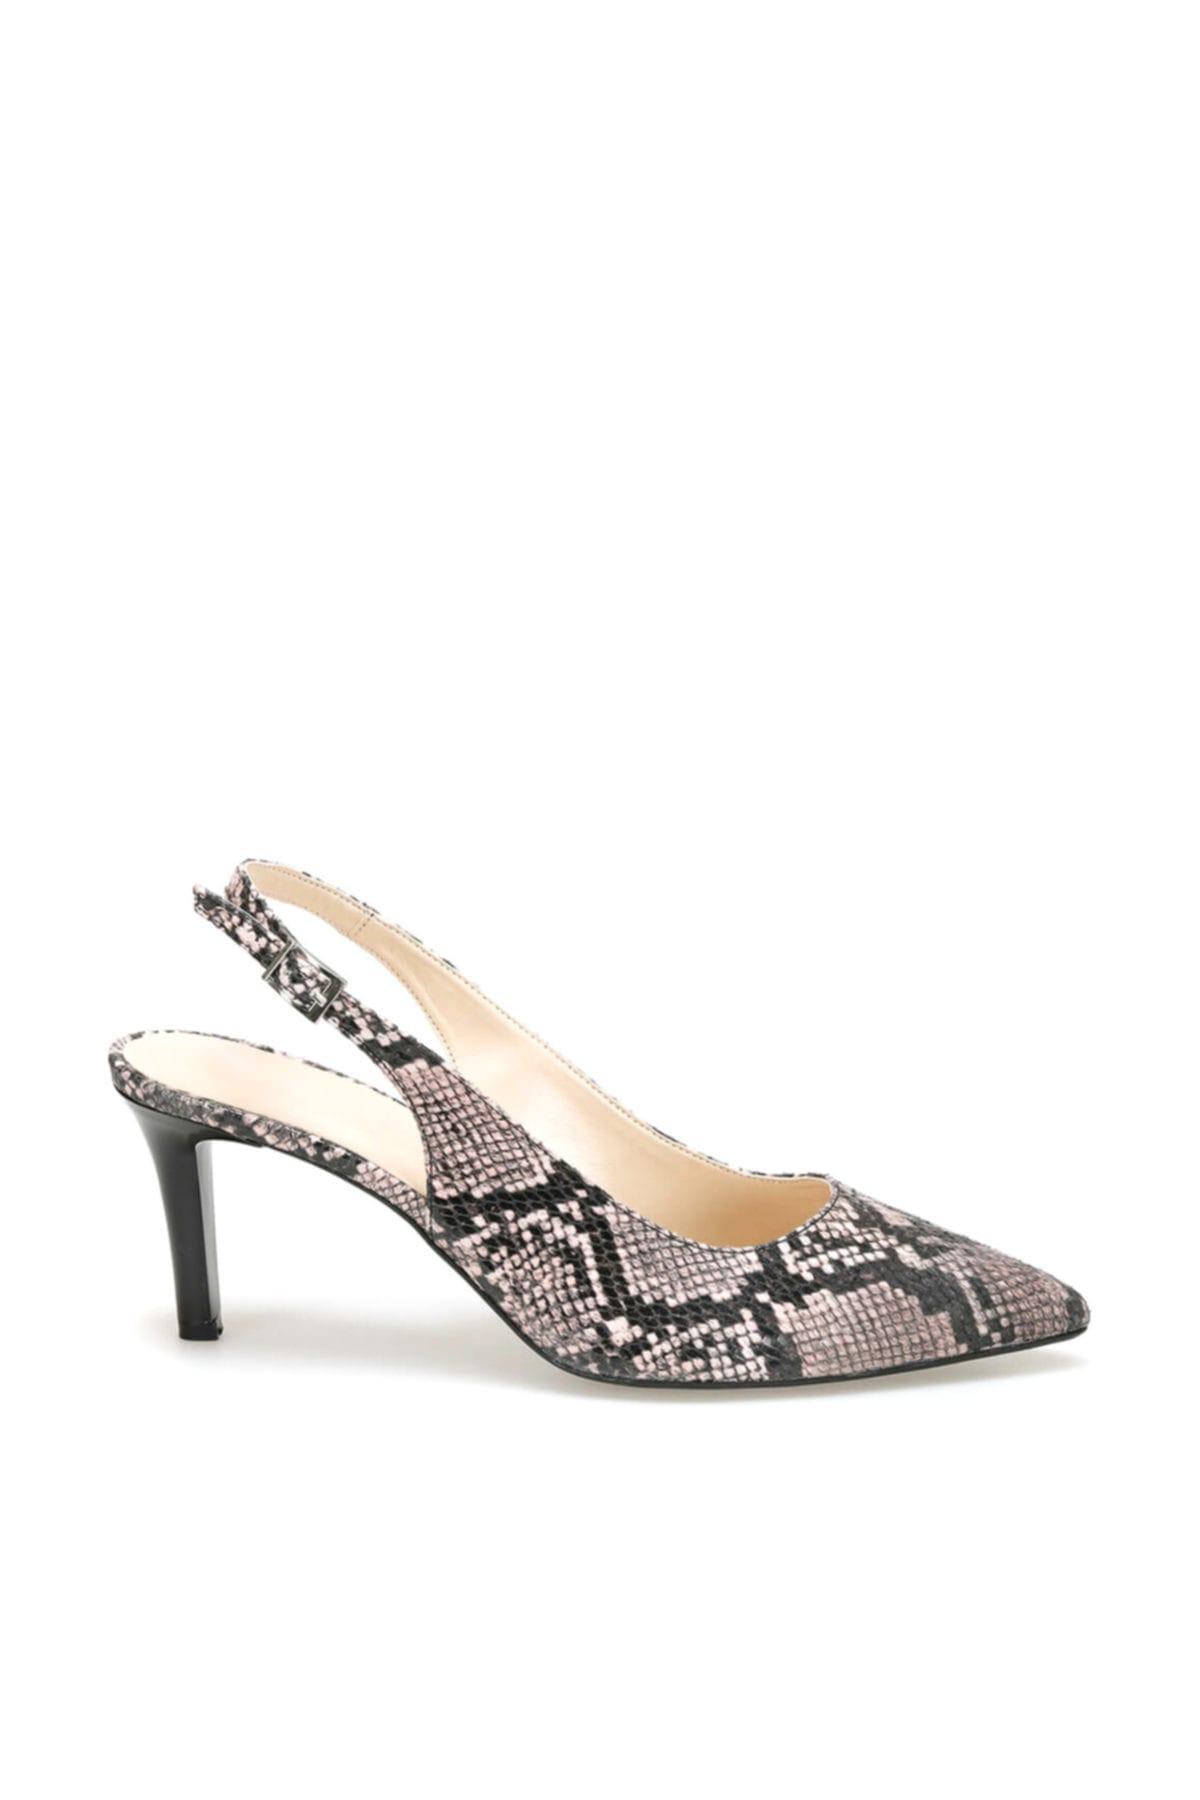 Miss F Ds19150 Yılan Rengi Pudra Kadın Ayakkabı 100443292 2